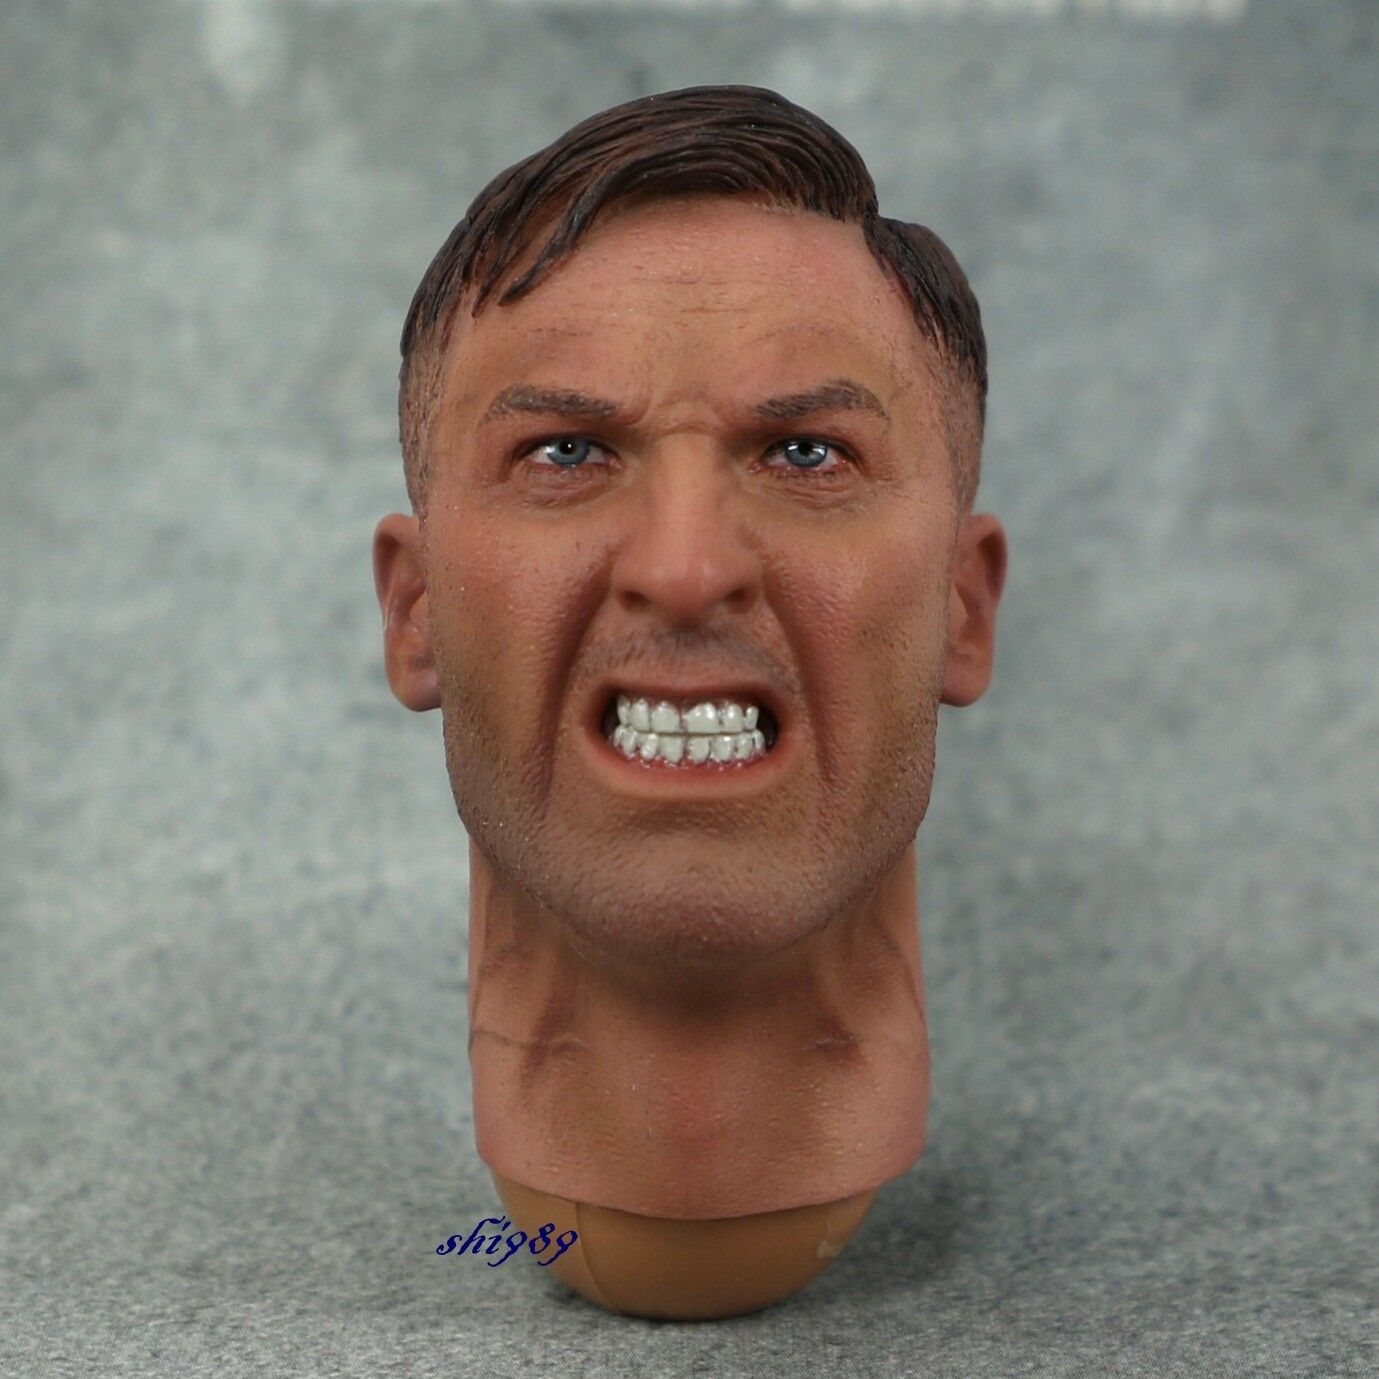 DID D80131 D80131 D80131 WWII German Panzer Divison Reich Mg42 Gunner B 1 6 Scale Head Sculpt 8af8d7